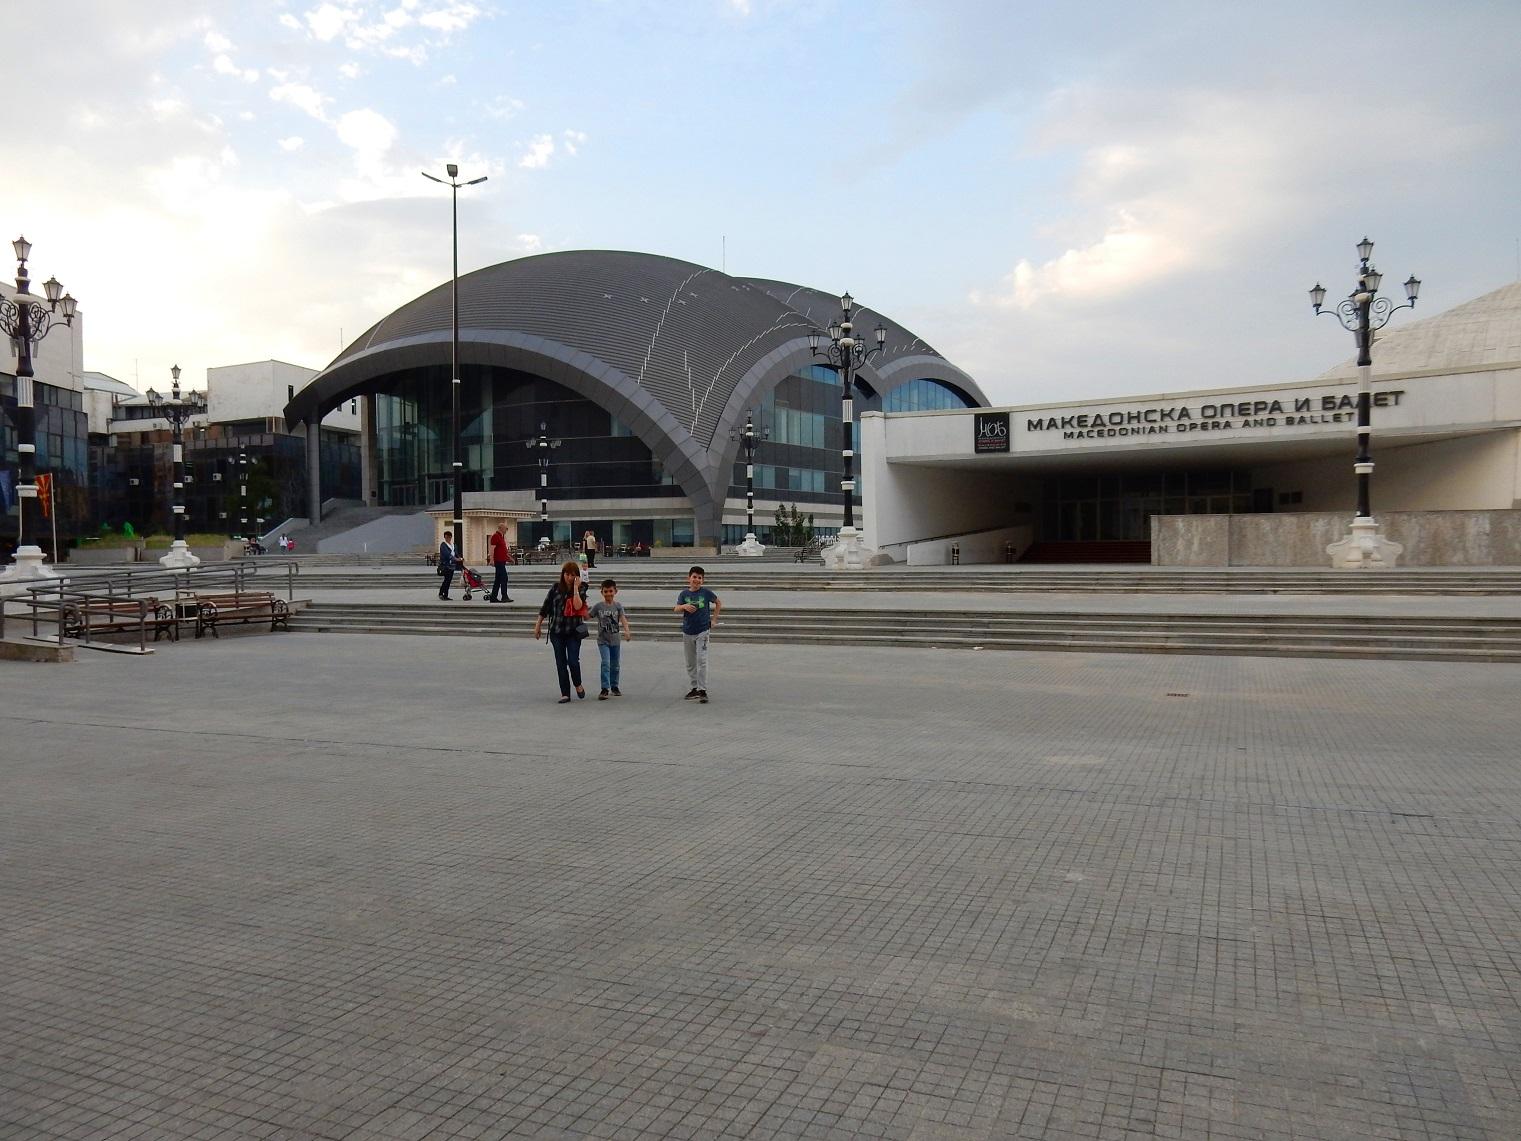 Skopje Macedonian Opera and Ballet